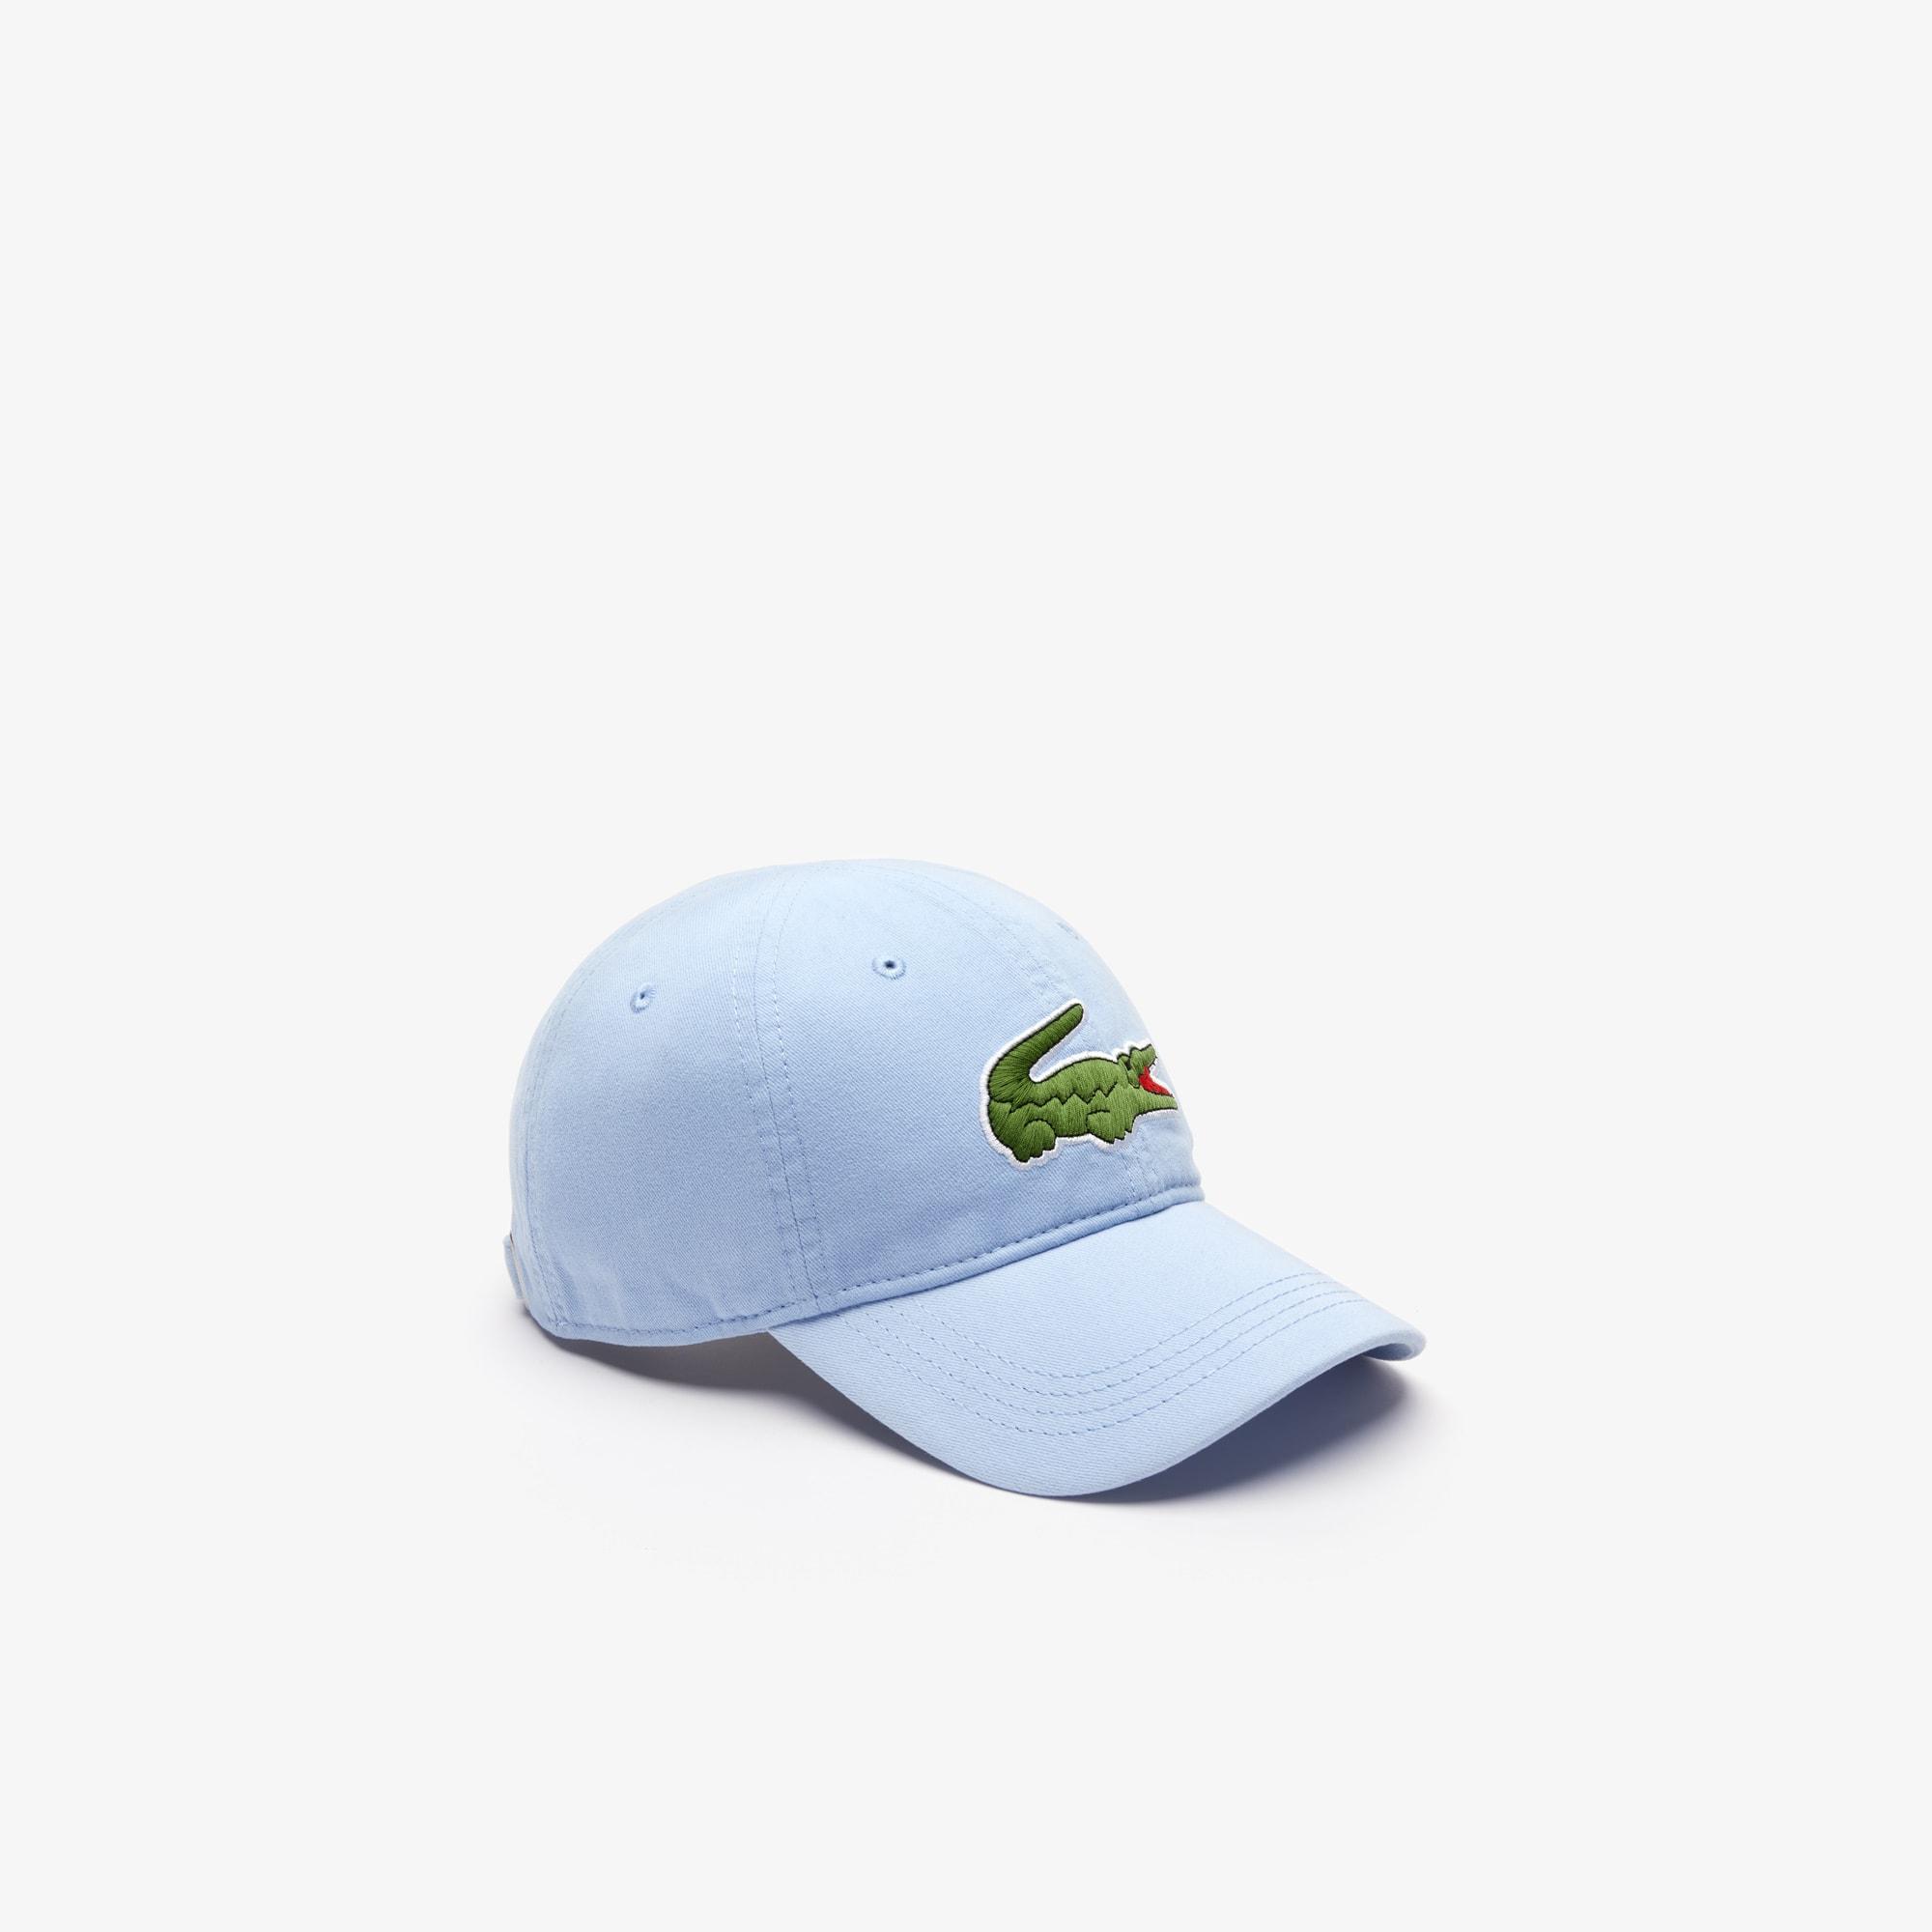 777fa8c671 Caps & Hats | Men's Accessories | LACOSTE